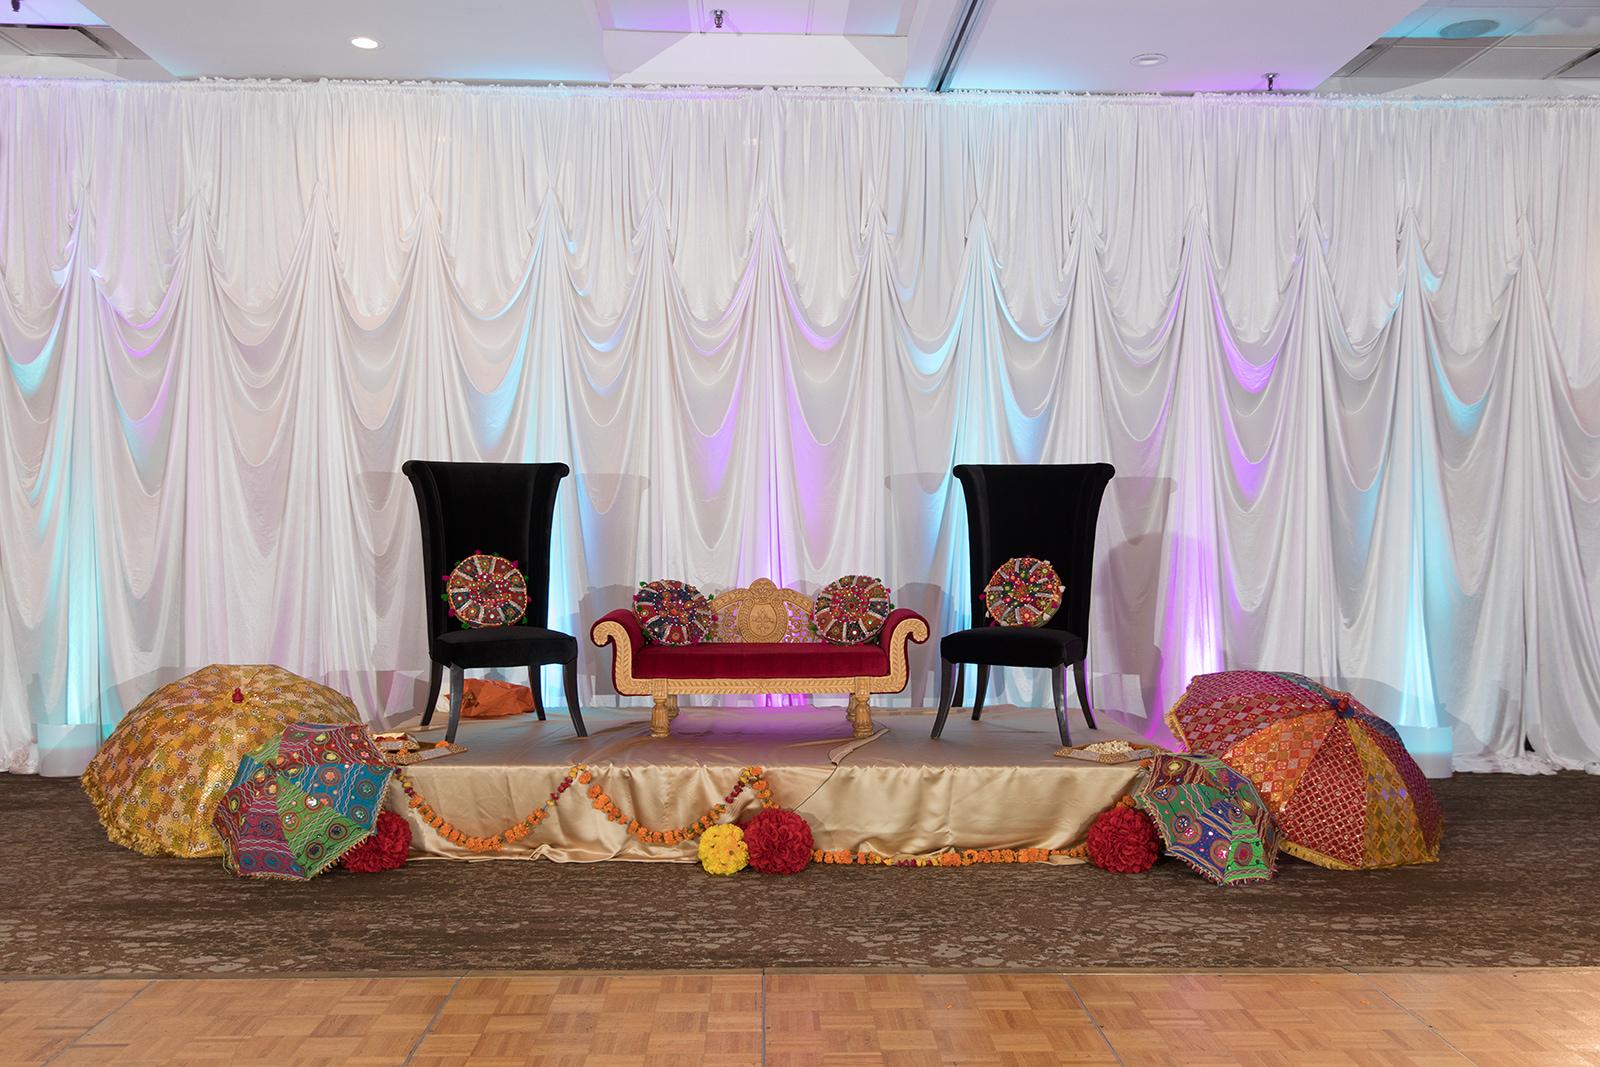 Le Cape Weddings - Sumeet and Chavi - Sangeet --5.jpg